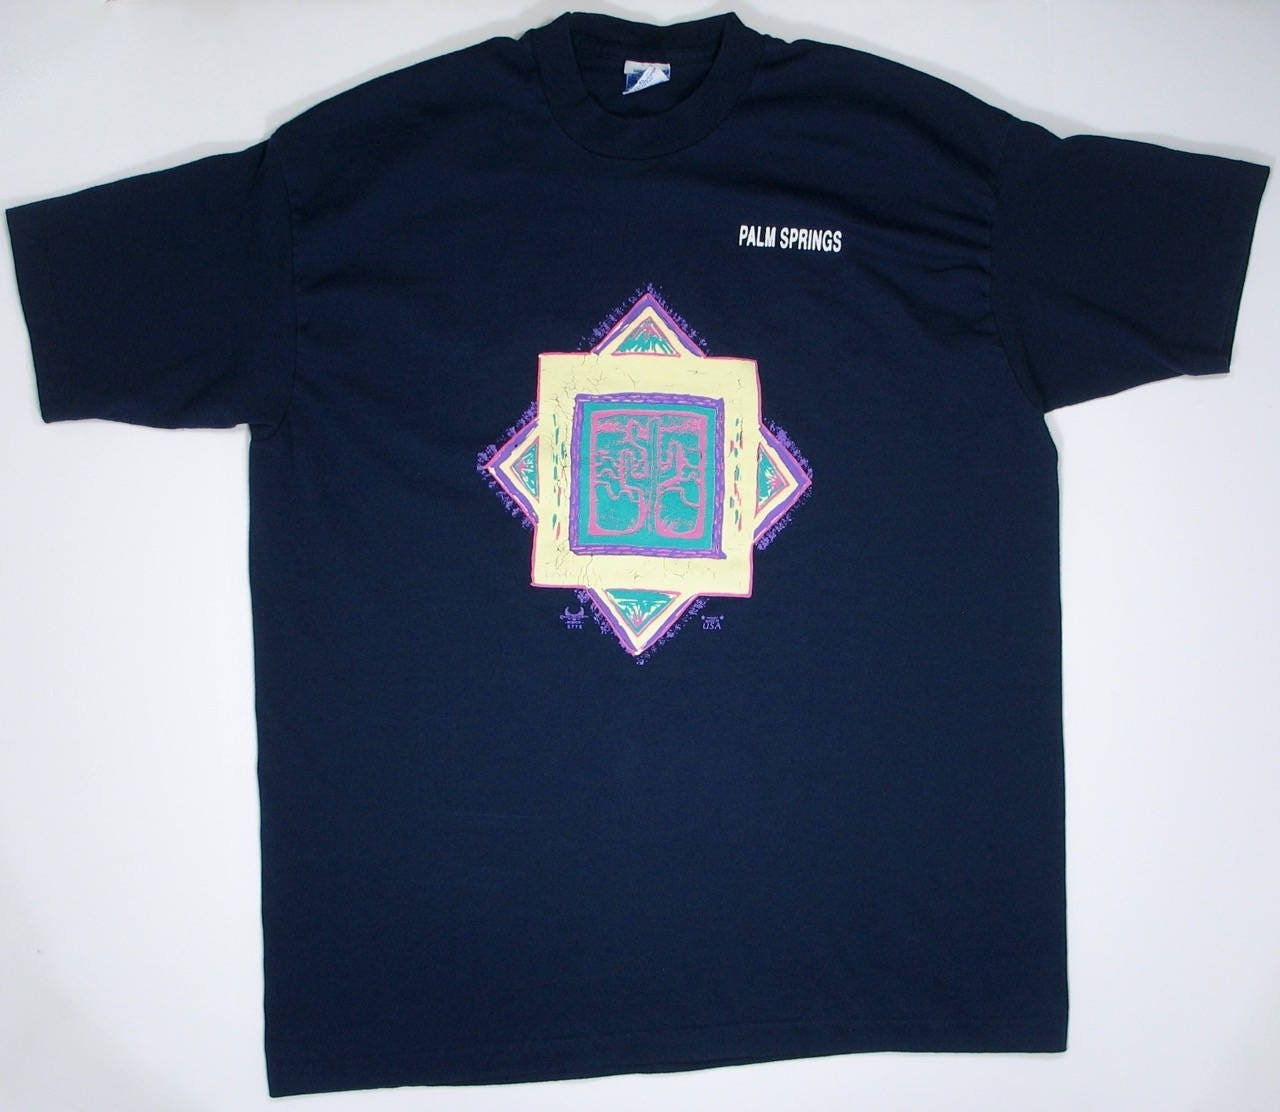 07e7576b6 Vintage Palm Springs T Shirt California L/XL soft tee navy | Etsy